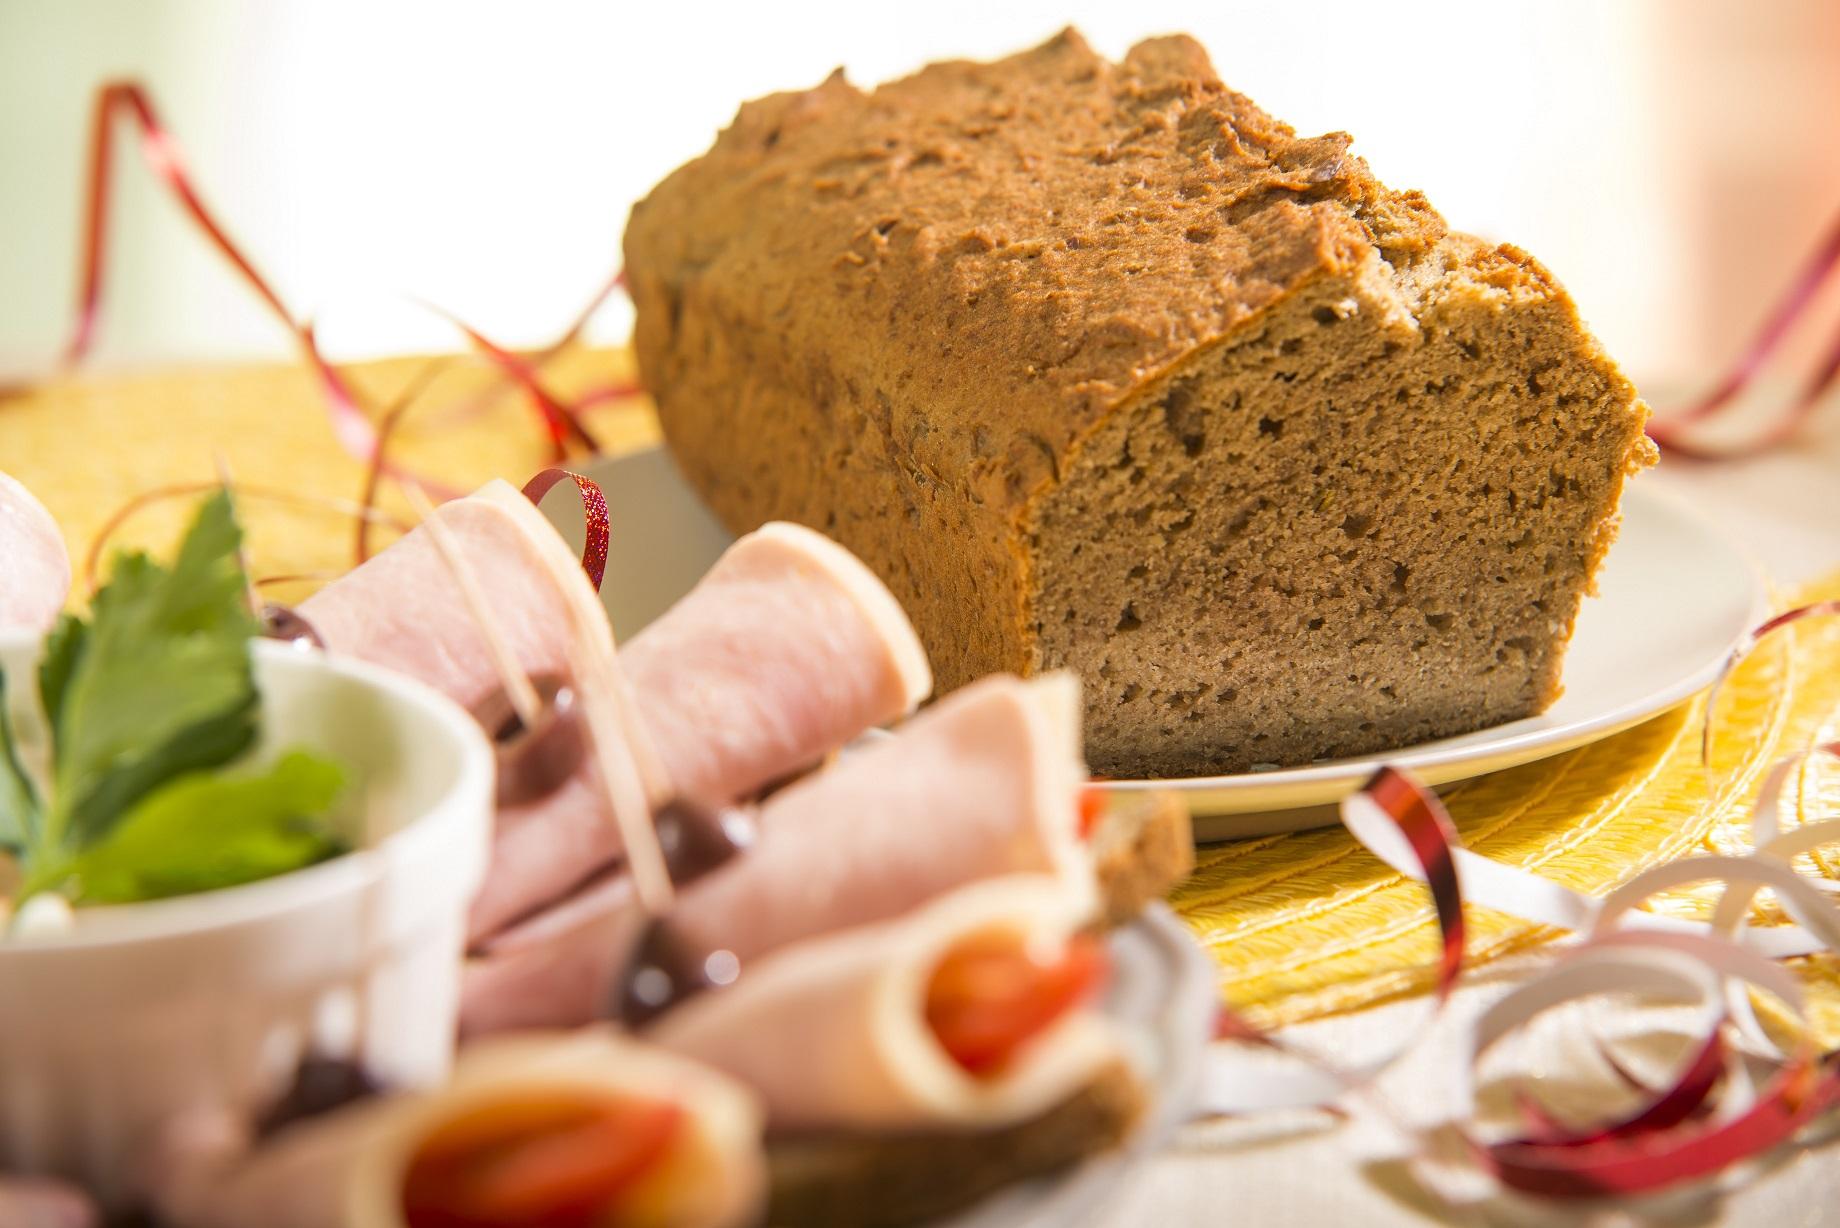 ujevi-dietas-teljeskiorlesu-lencse-kenyer.jpg